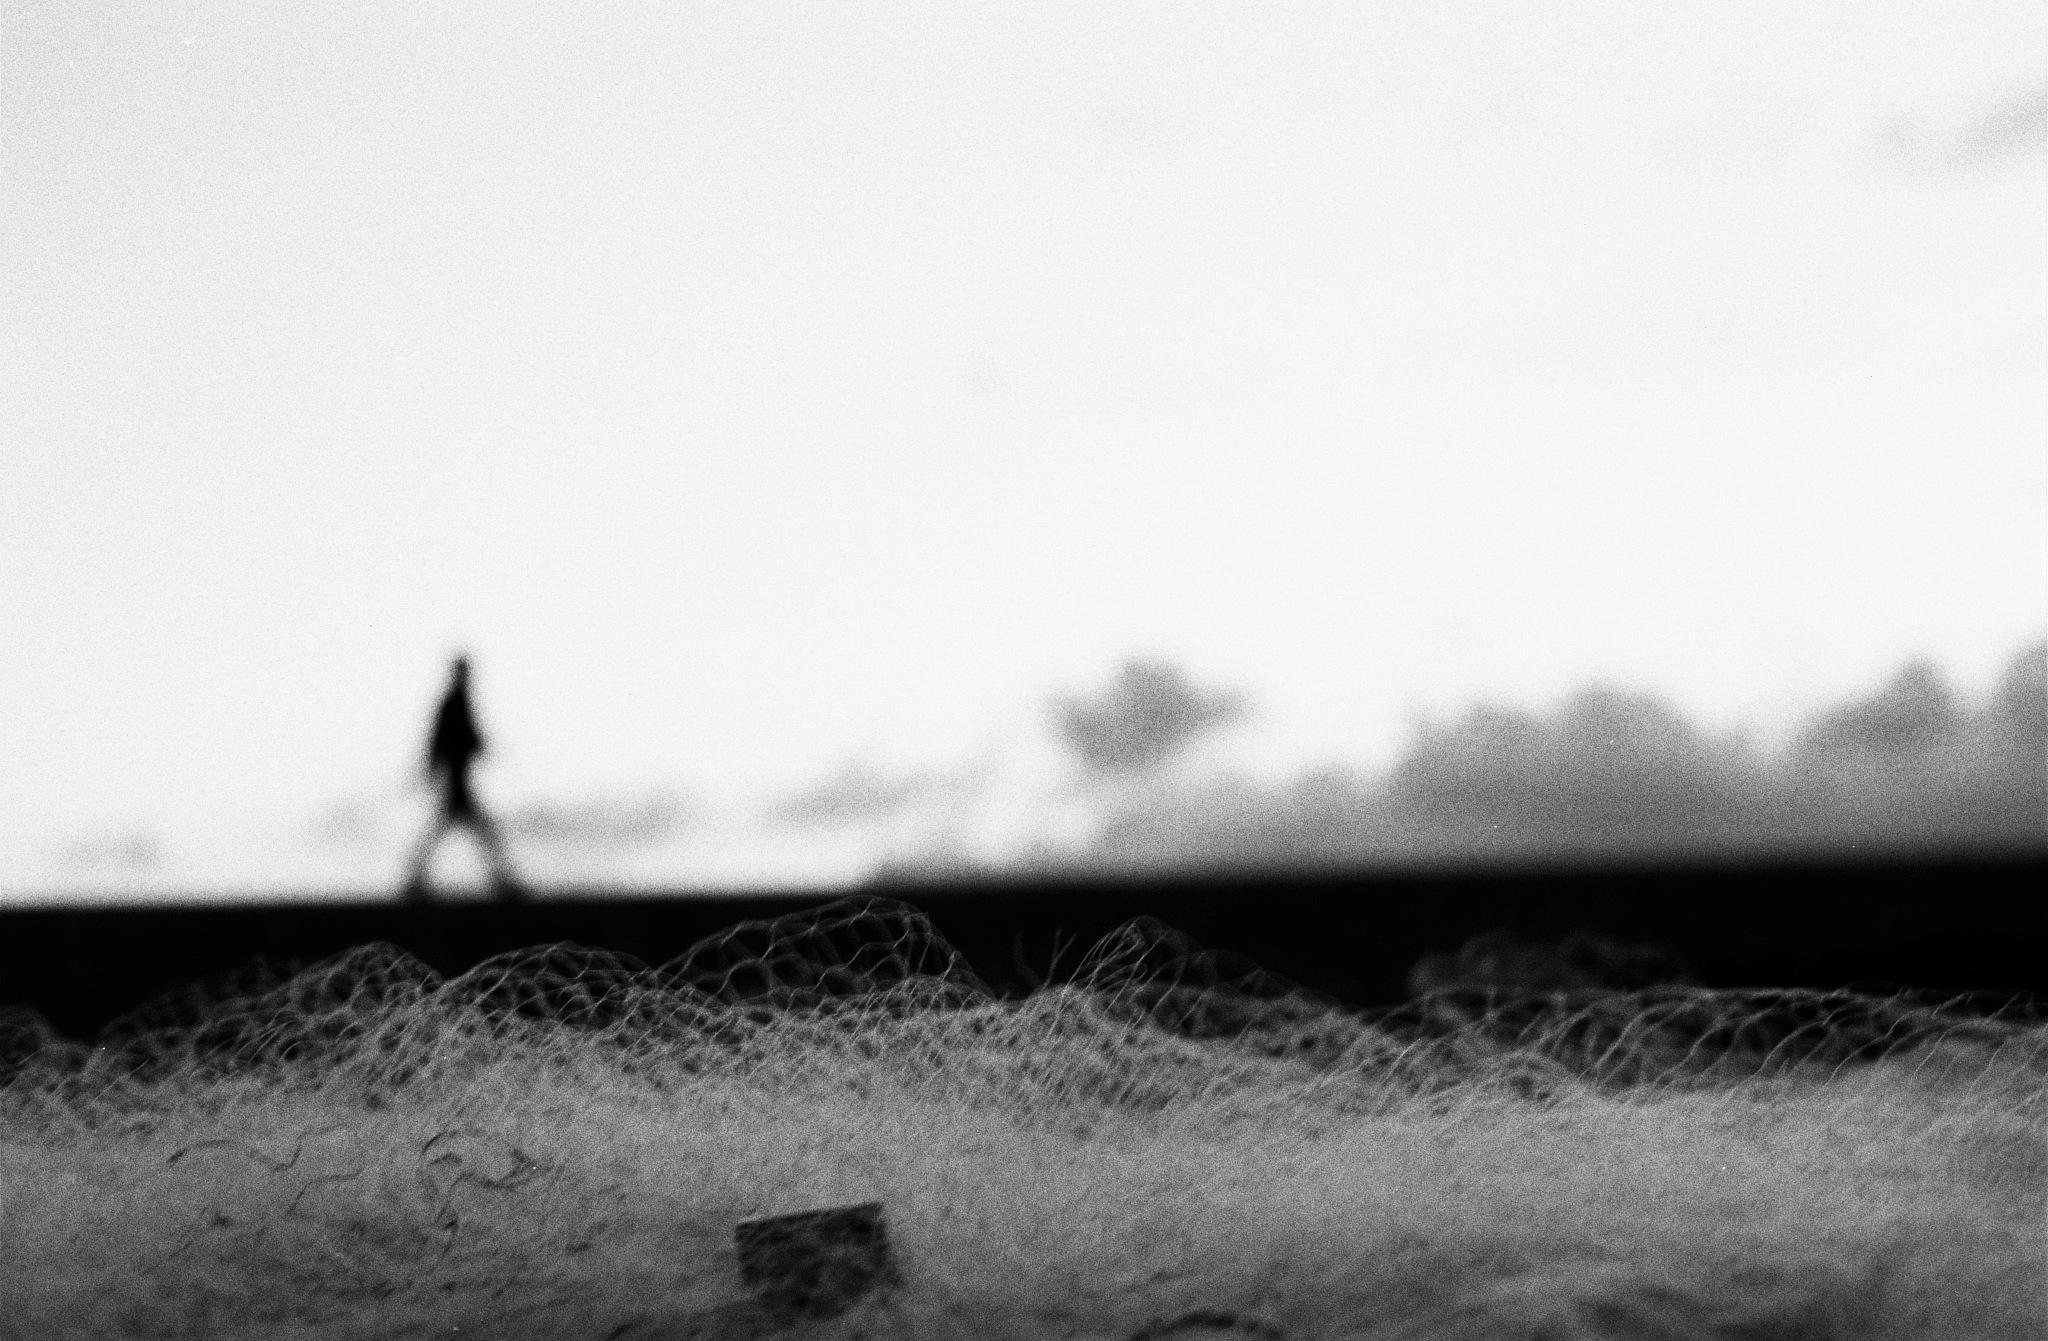 Fishing net and man by Jorge Eduardo Gordillo Santos